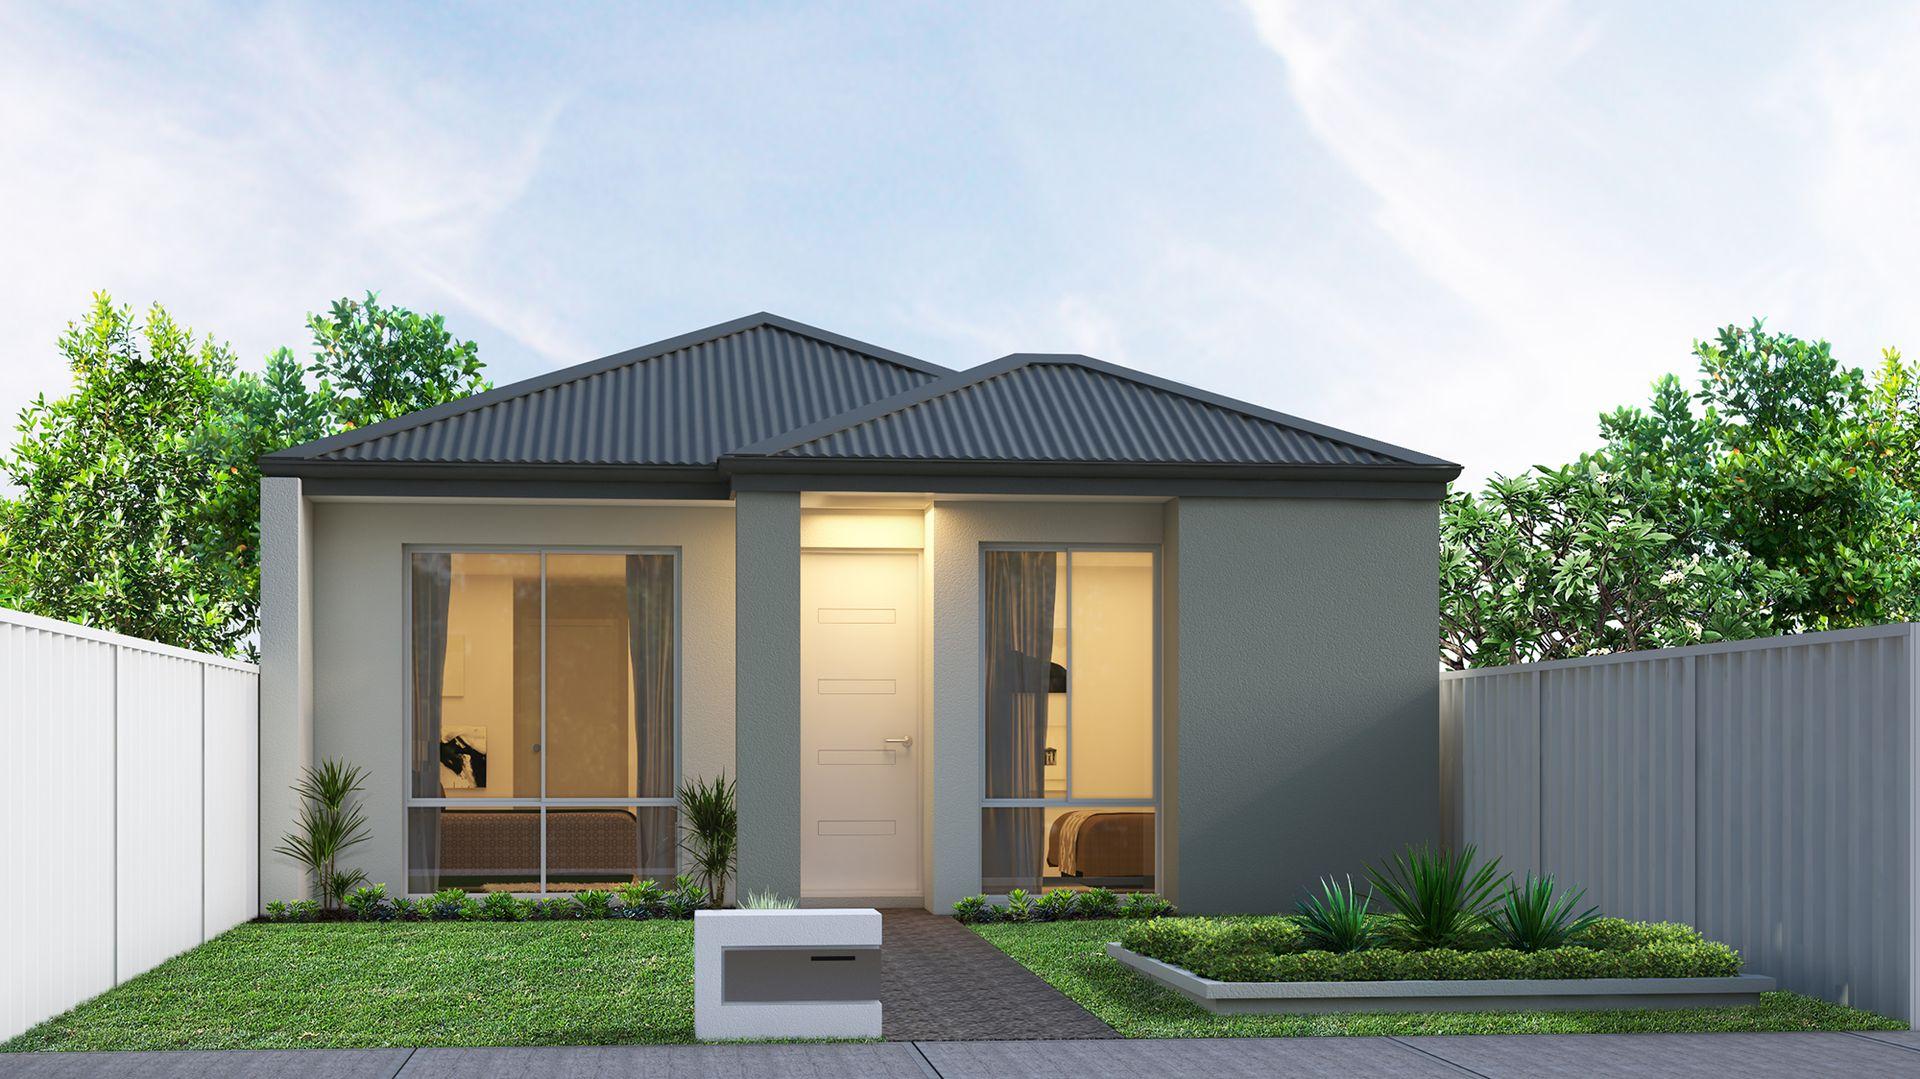 3 bedrooms New House & Land in Lofter way YANCHEP WA, 6035